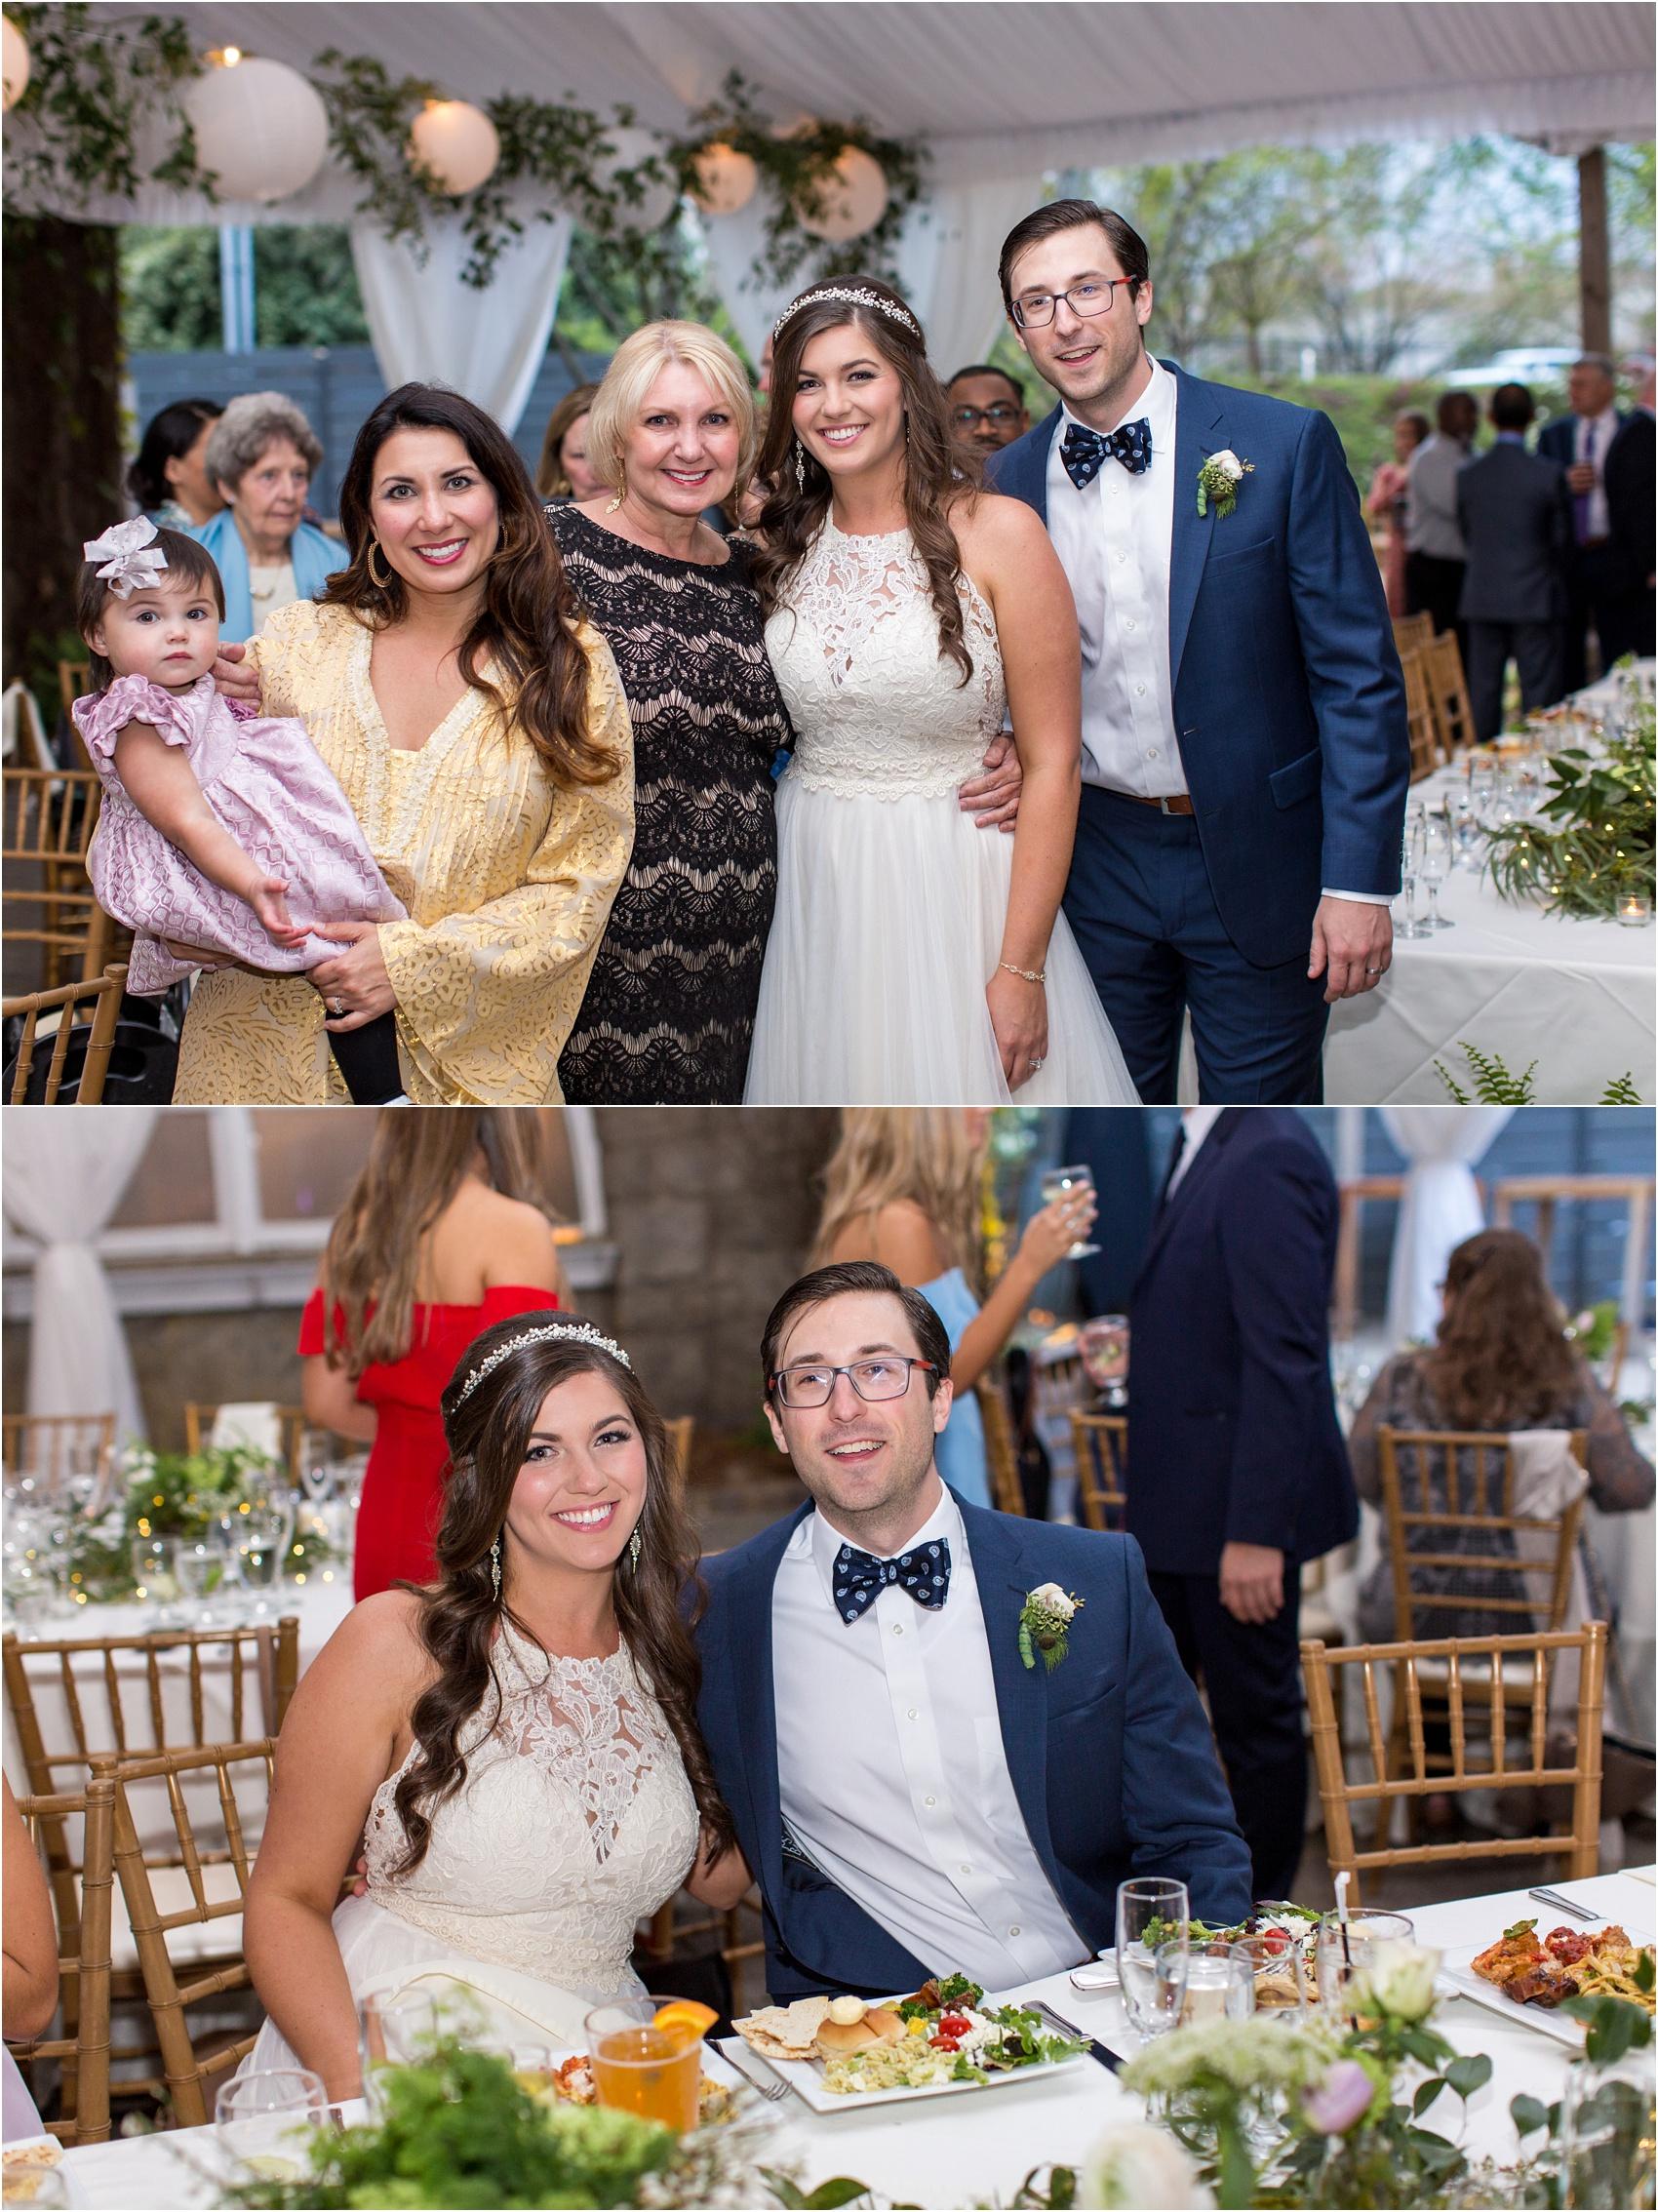 Savannah Eve Photography- Groseclose Wedding- Blog-99.jpg